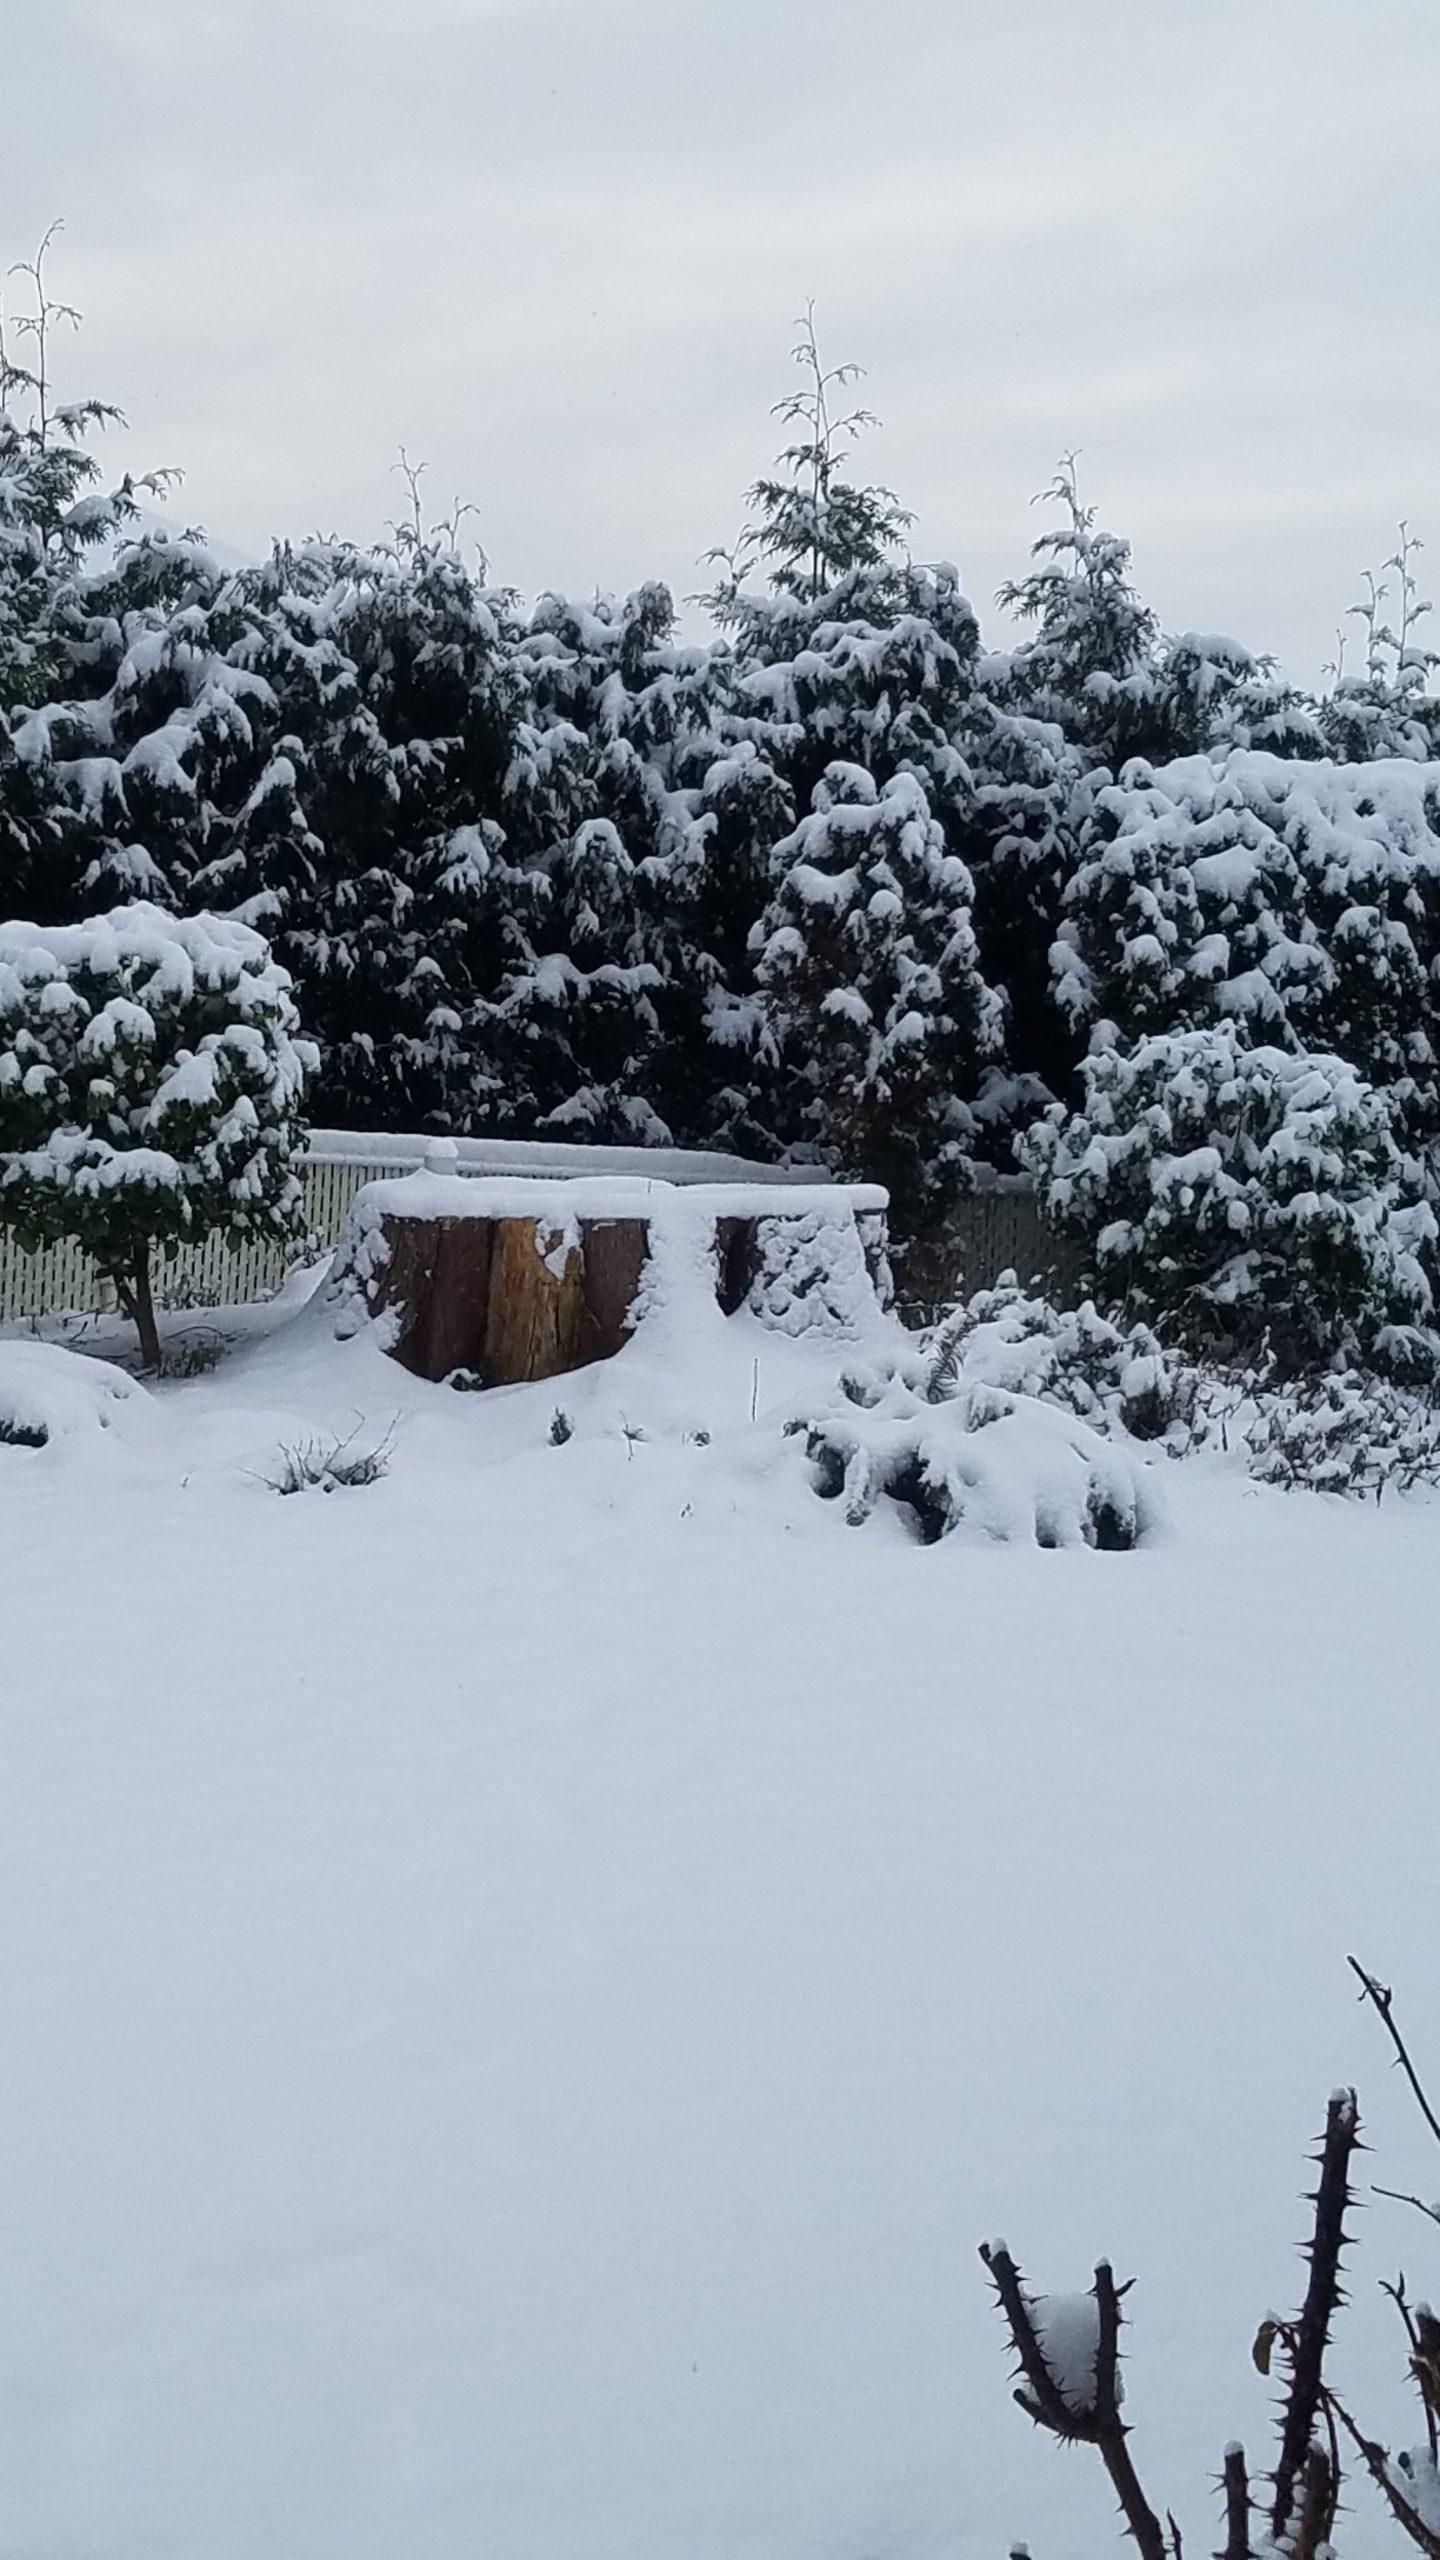 Snowy tree stump.